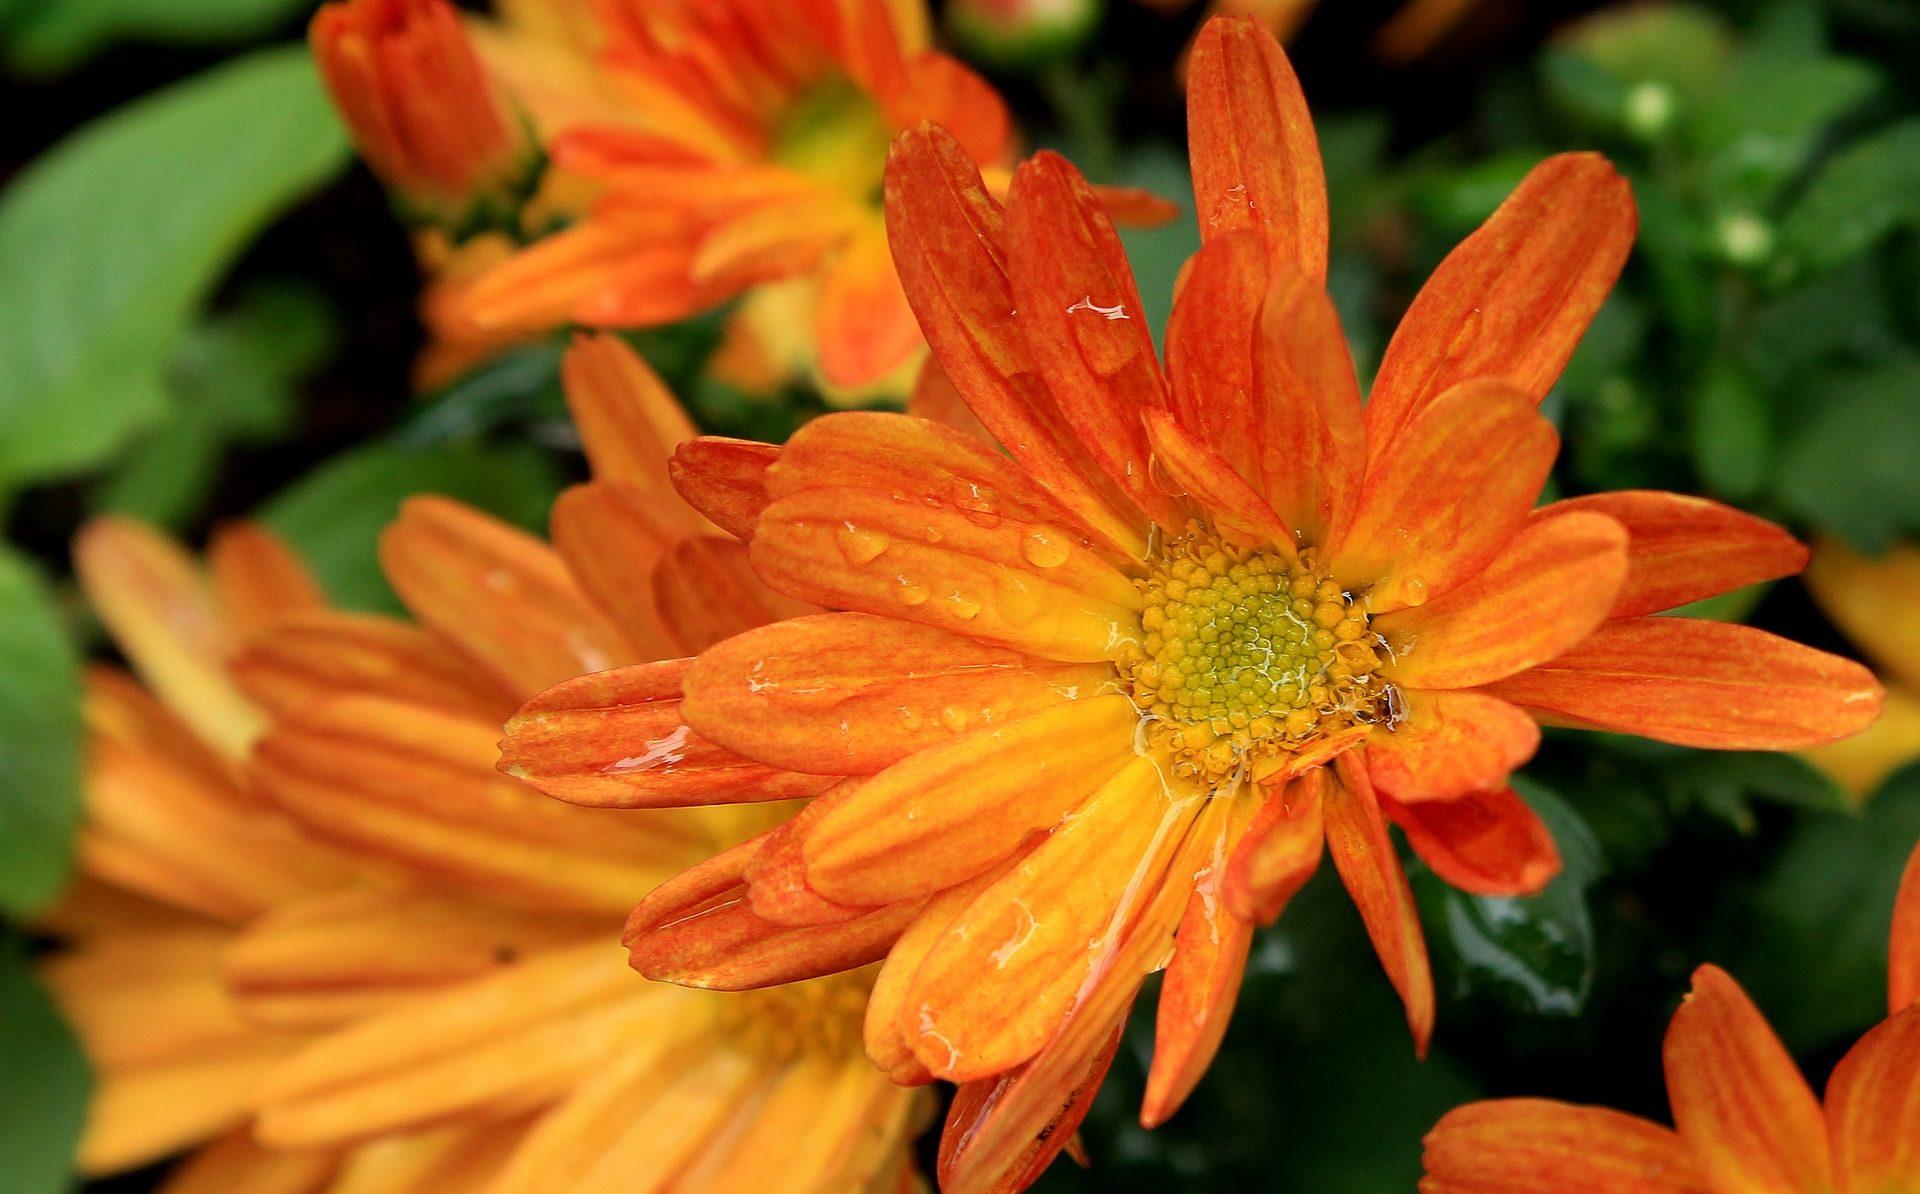 Margarita, Orange, Blume, Blütenblätter, Garten, Tropfen, Regen - Wallpaper HD - Prof.-falken.com